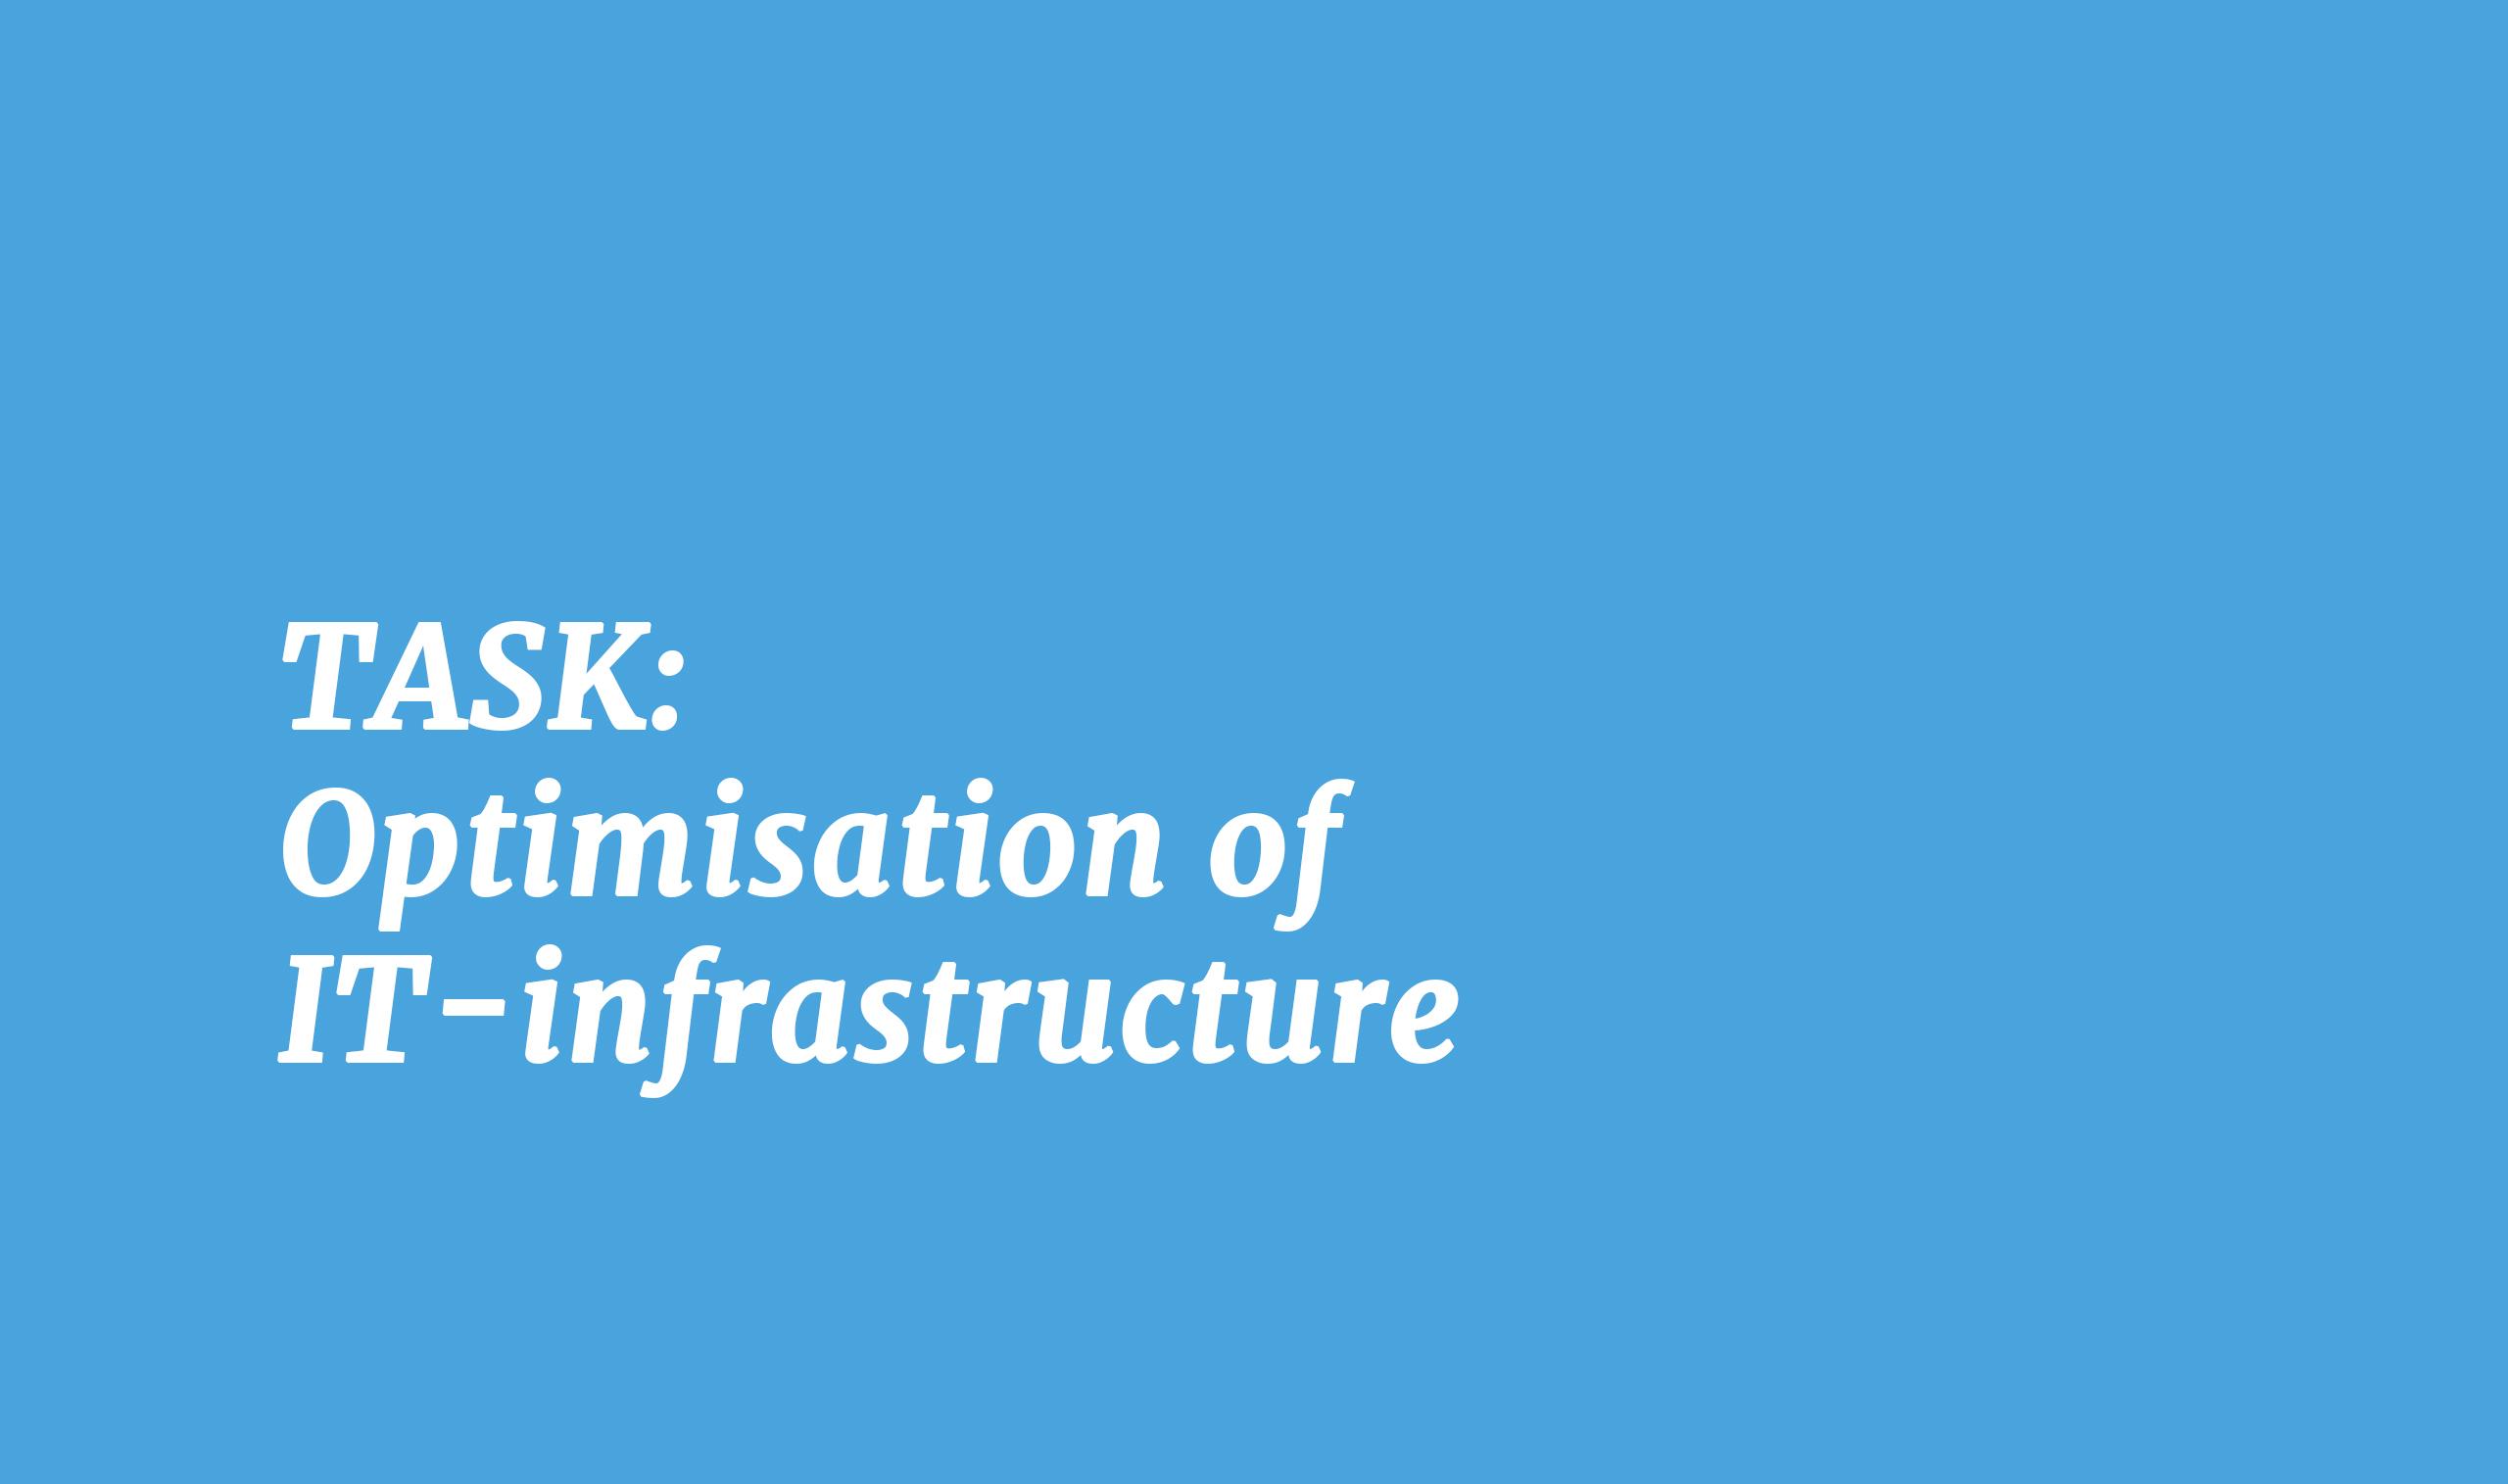 AXXCON IT Infrastucture